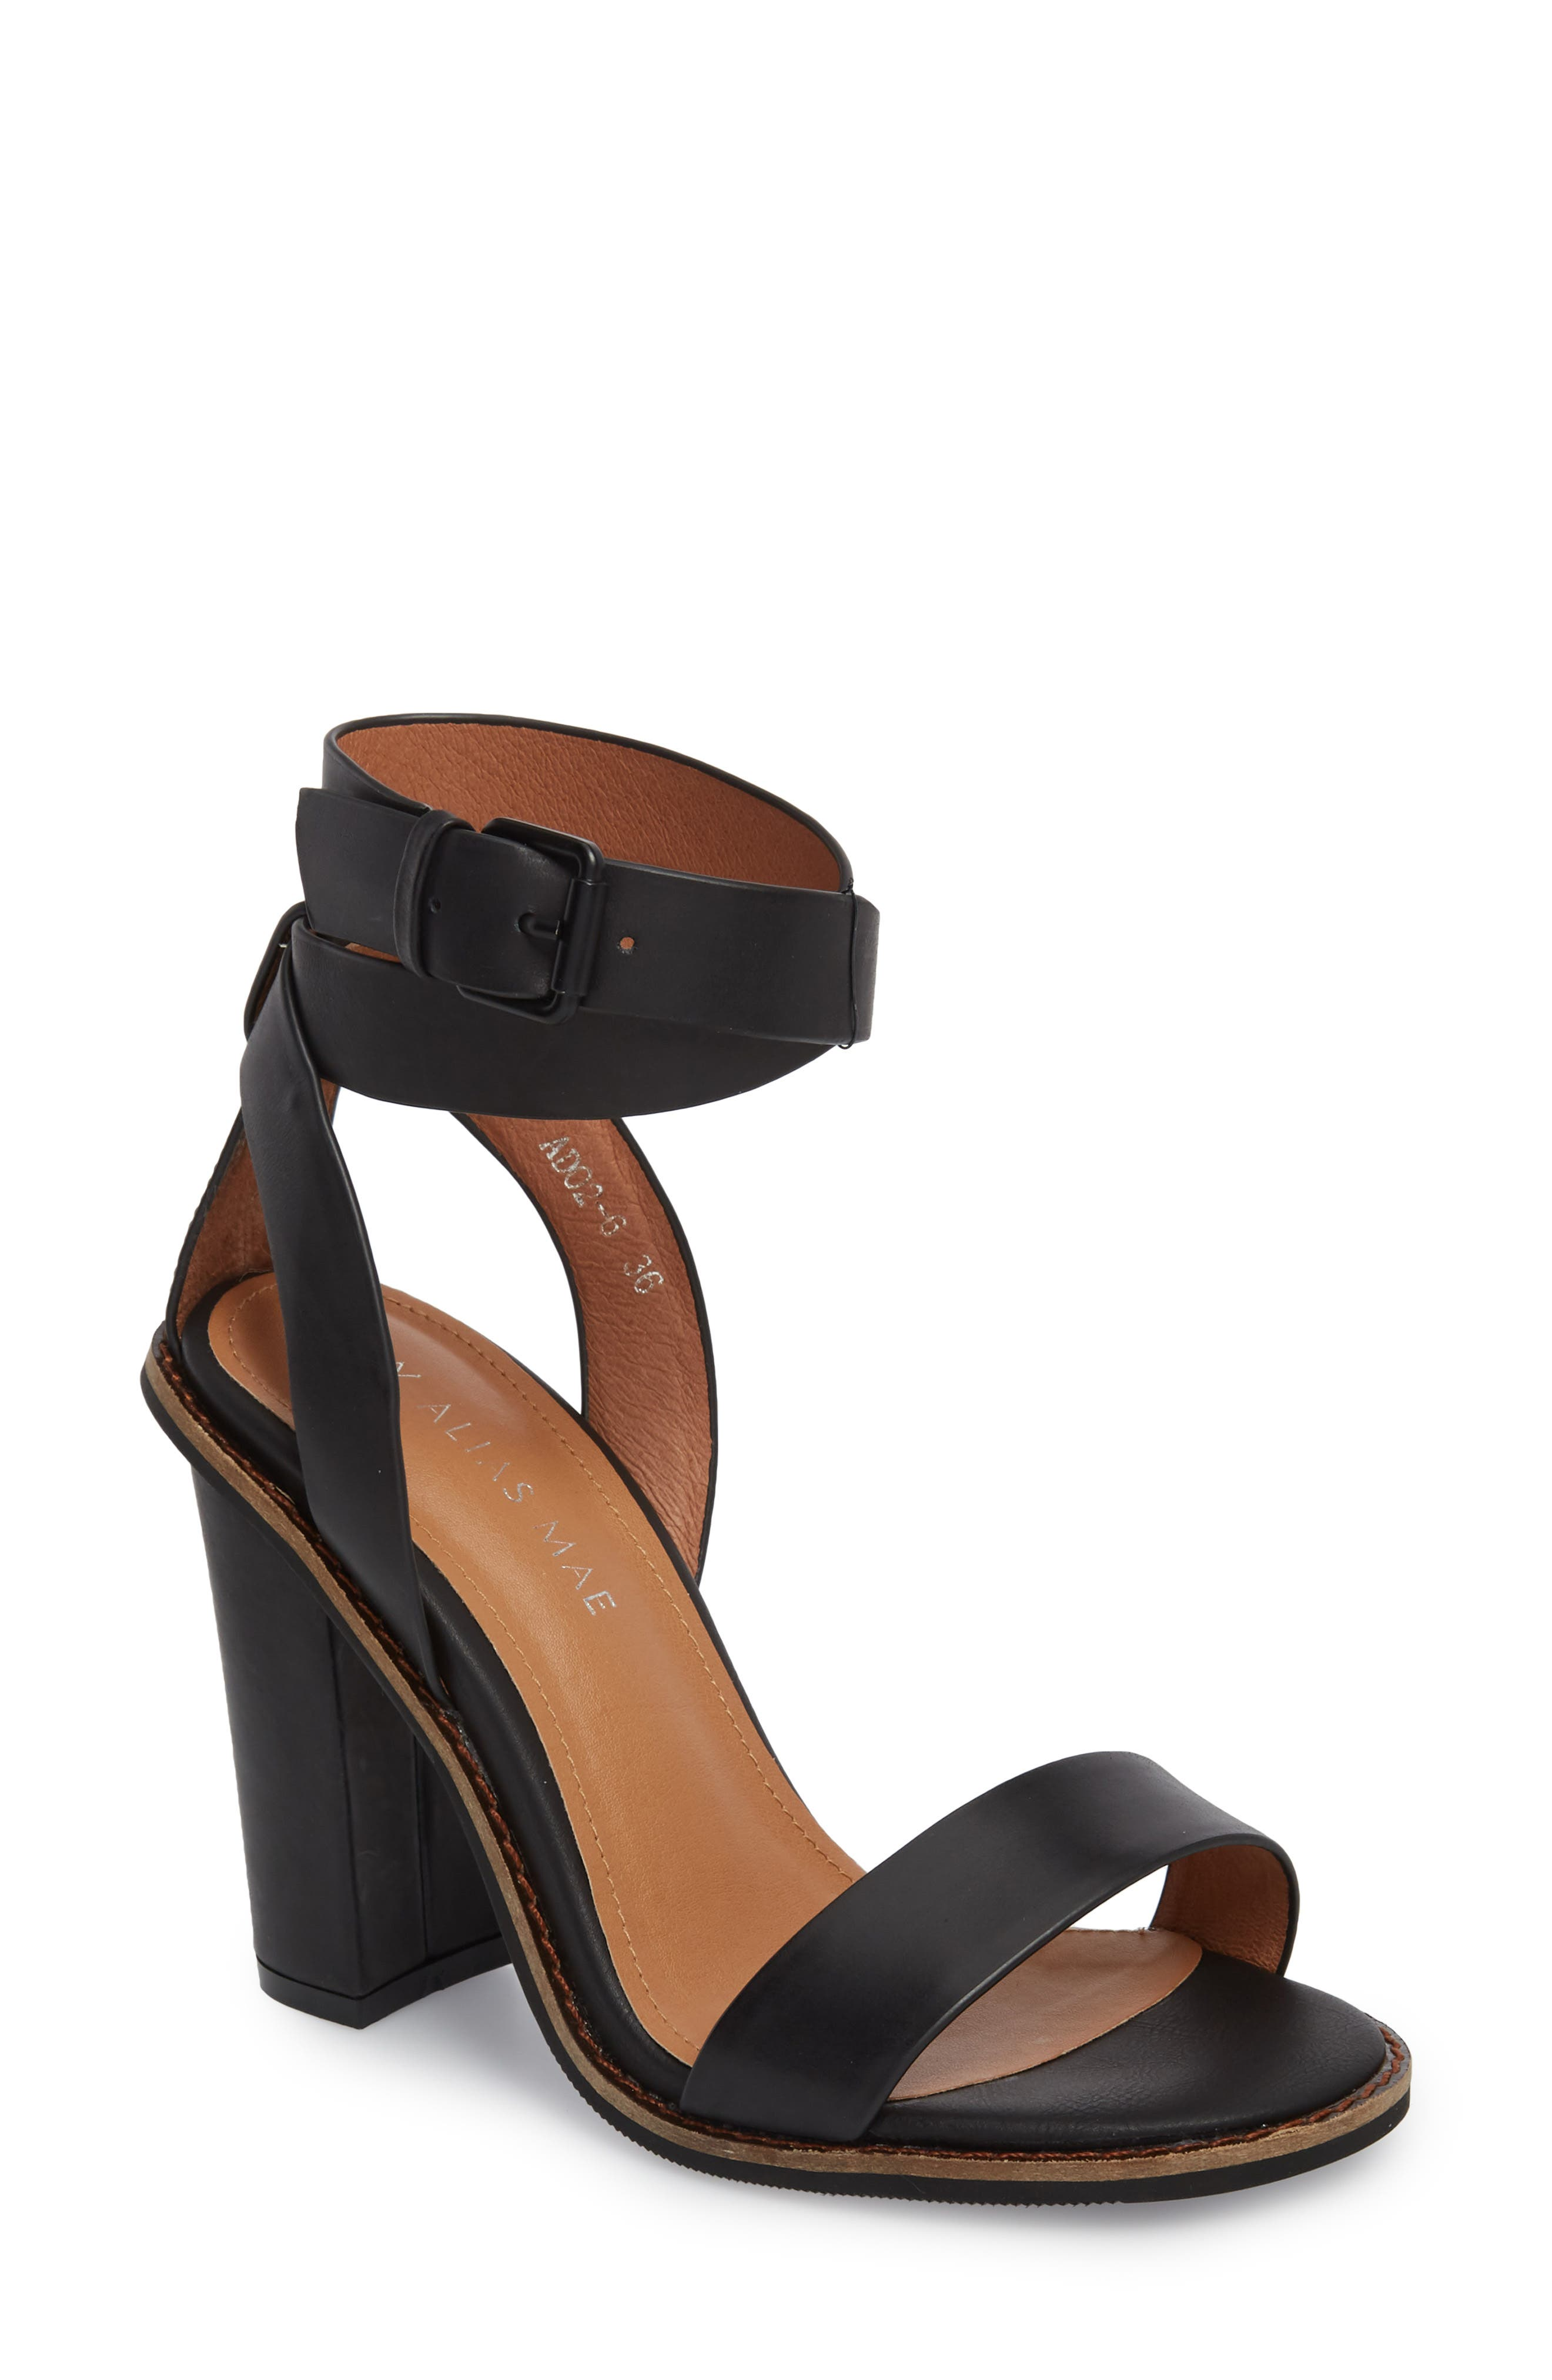 Calito Ankle Strap Sandal,                             Main thumbnail 1, color,